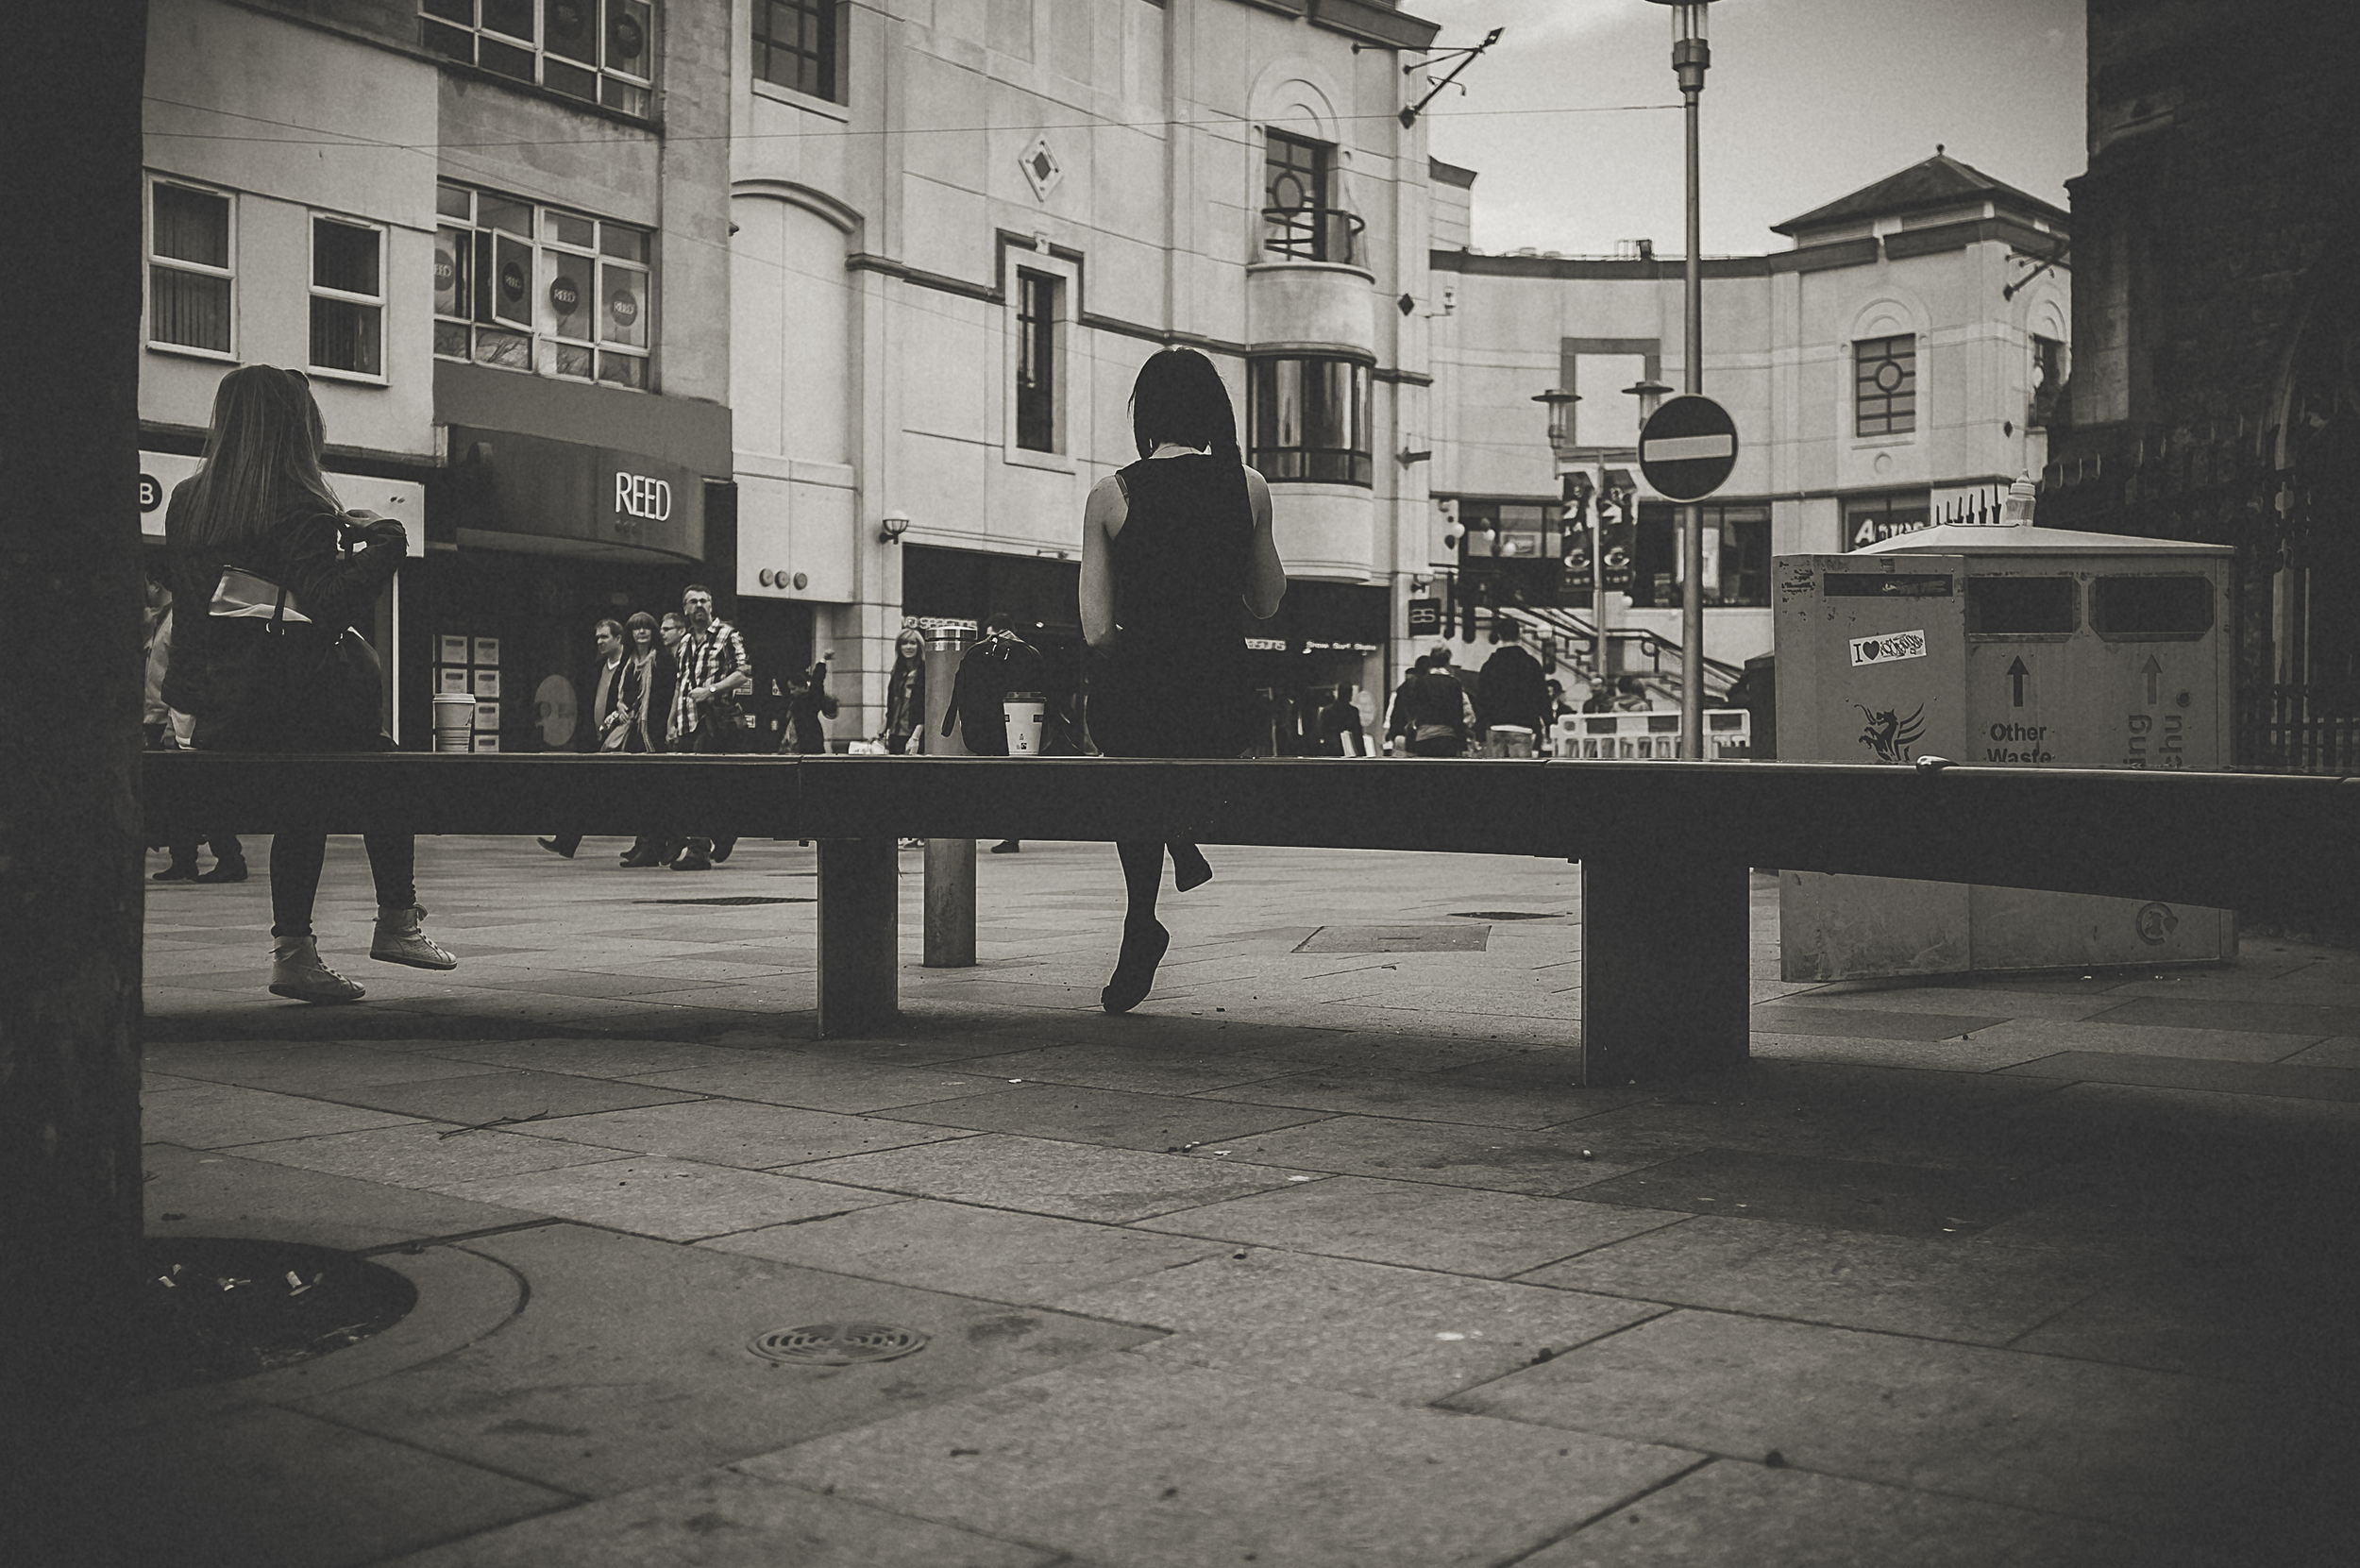 cardiff_street_photography_with_the_fuji_x100-16.jpg